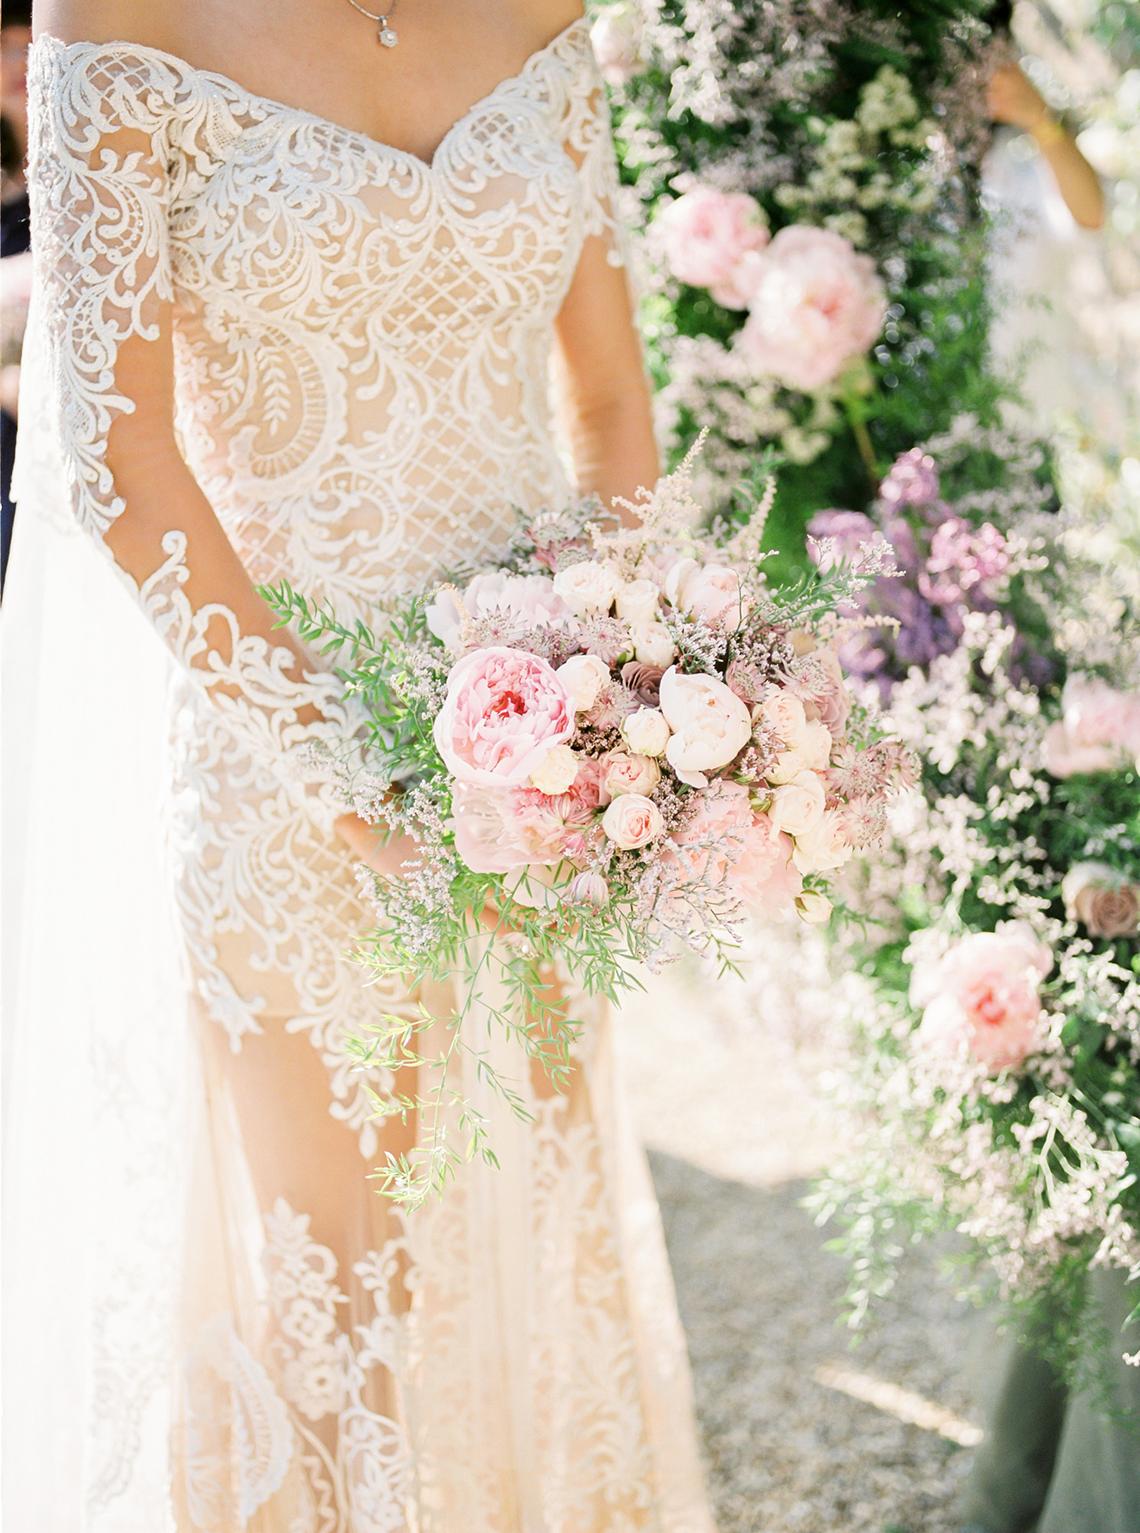 Romantic Florence Destination Wedding at Villa le Fontanelle – Olga Makarova 41